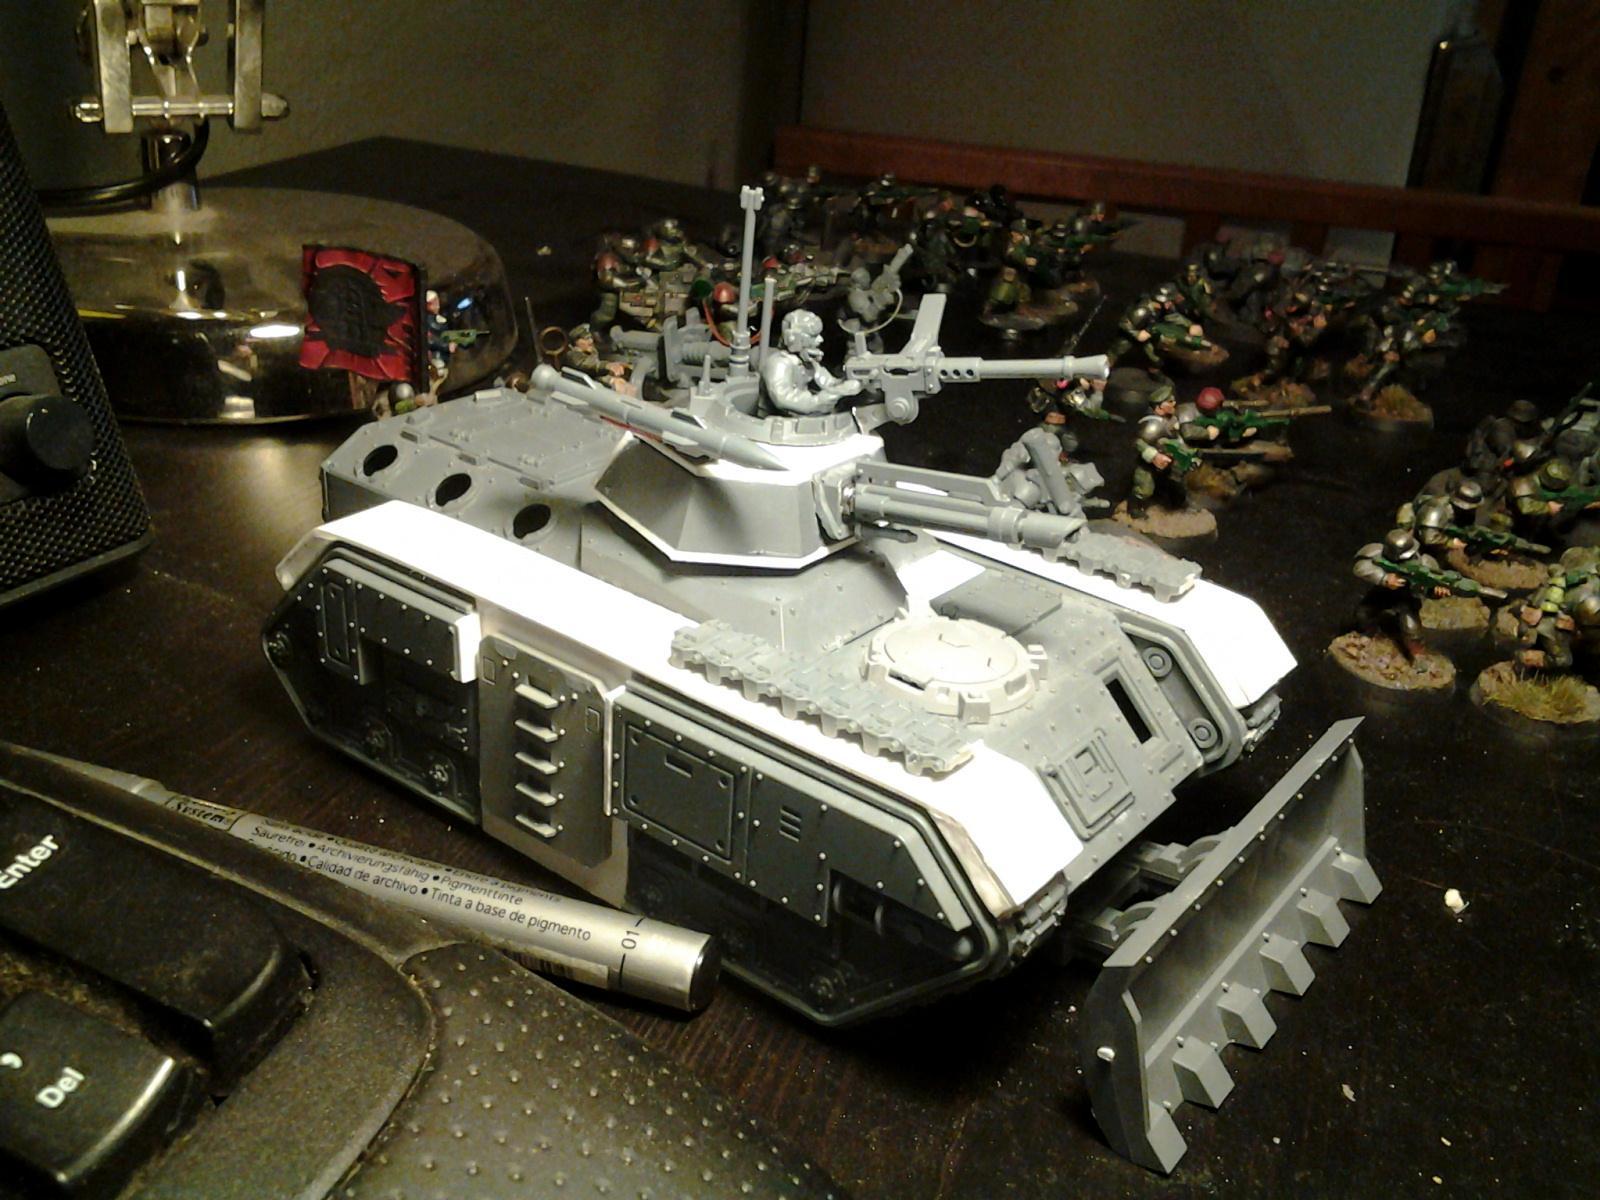 Chimera, Conversion, Imperial Guard, Kitbash, Panzer, Tank, Warhammer 40,000, World War 2